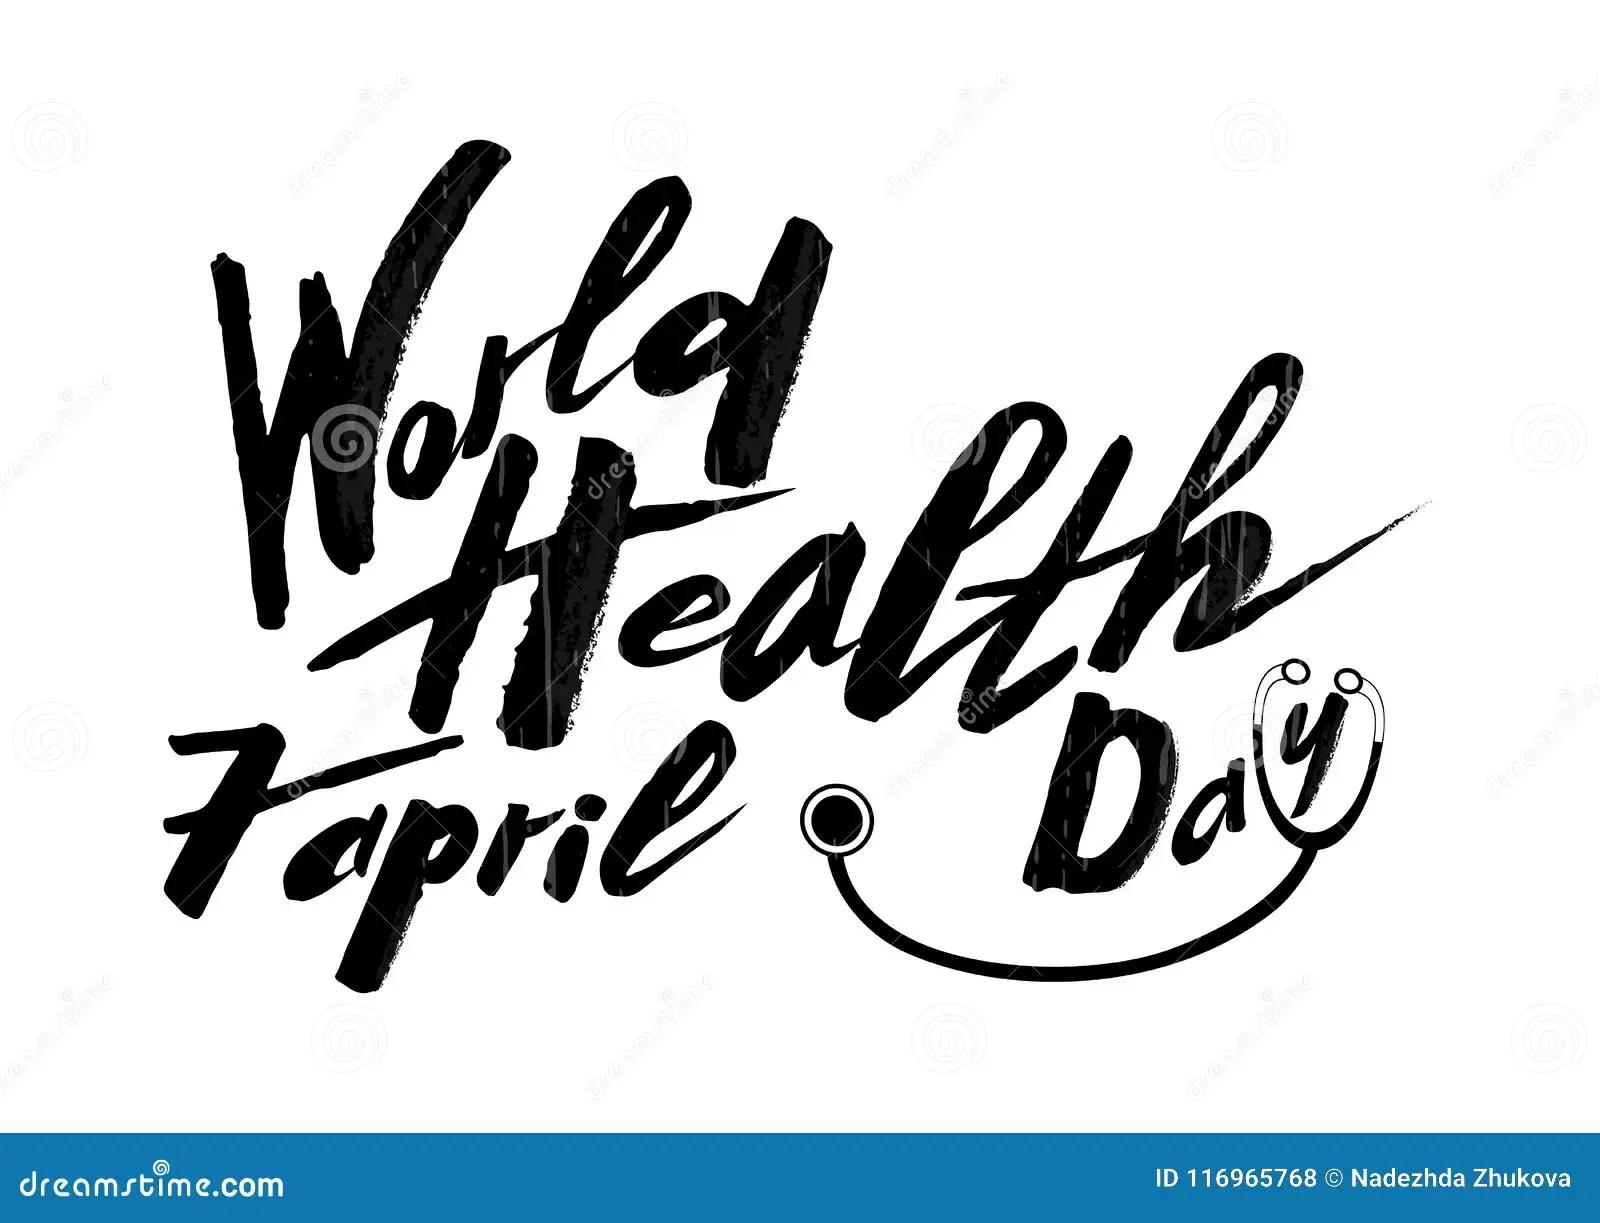 Handwritten Text Of World Health Day On A Textured Pink